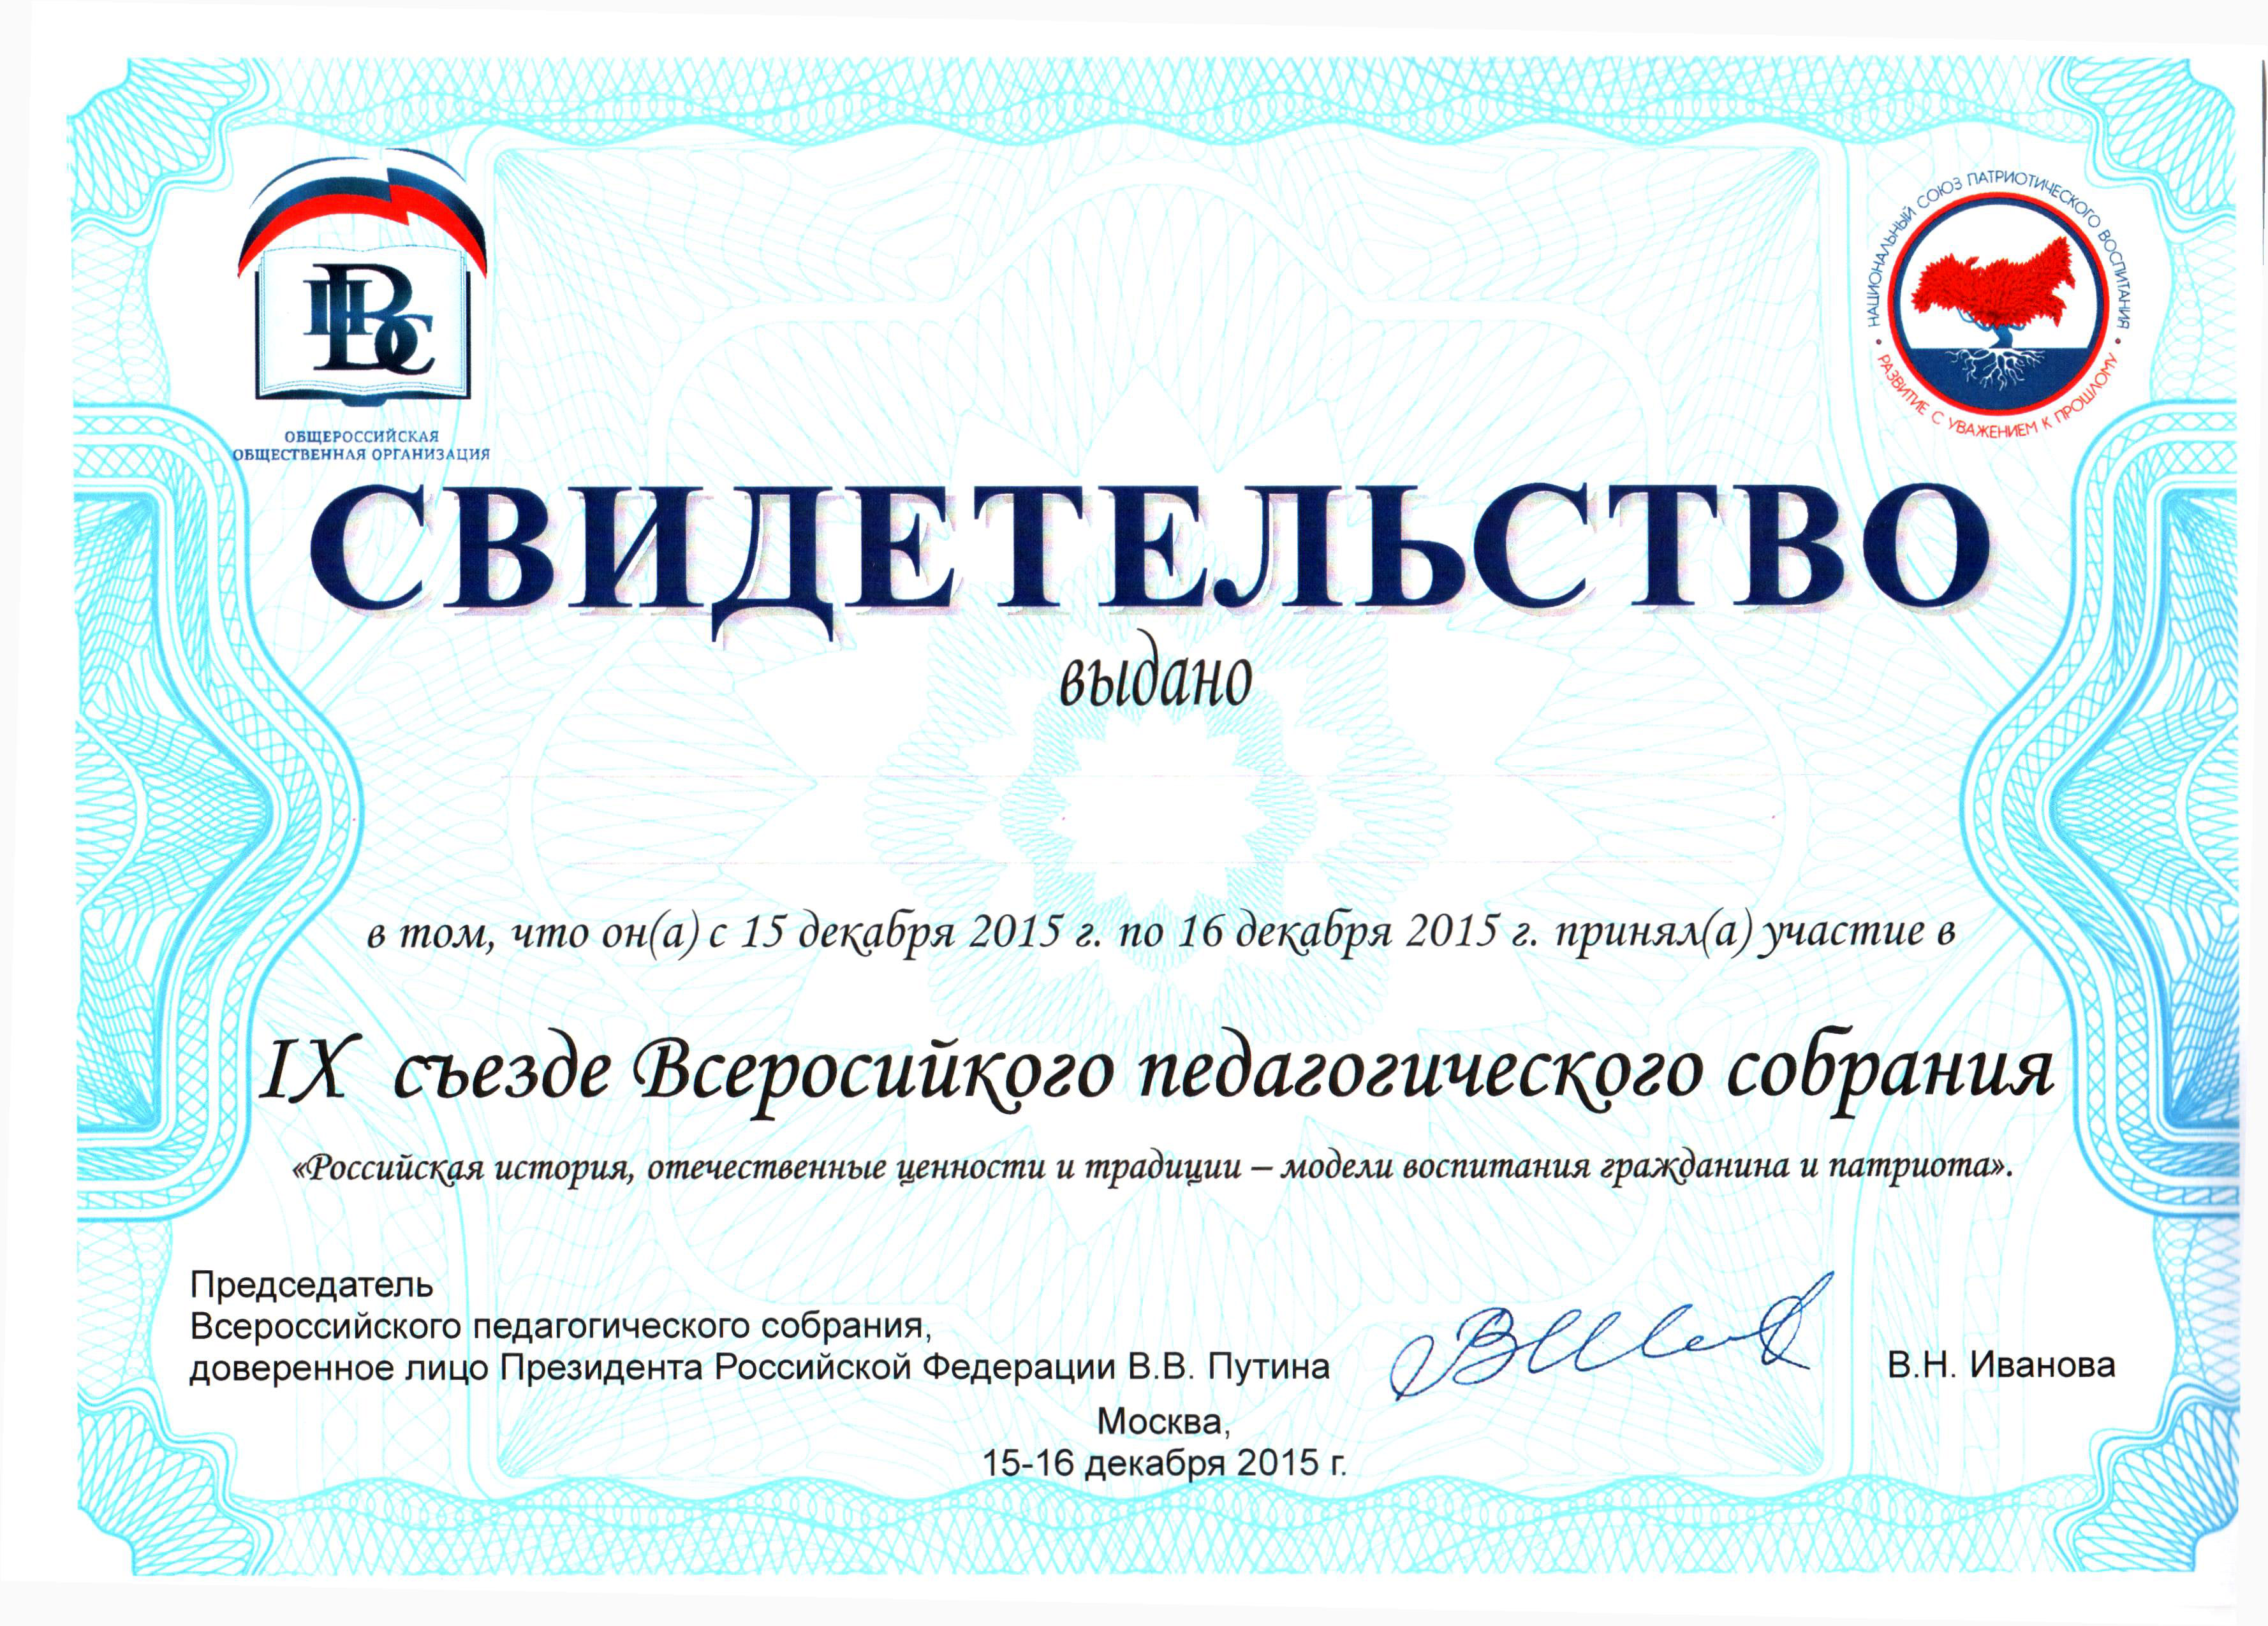 https://img-fotki.yandex.ru/get/14/17259814.15/0_93332_f3b67d01_orig